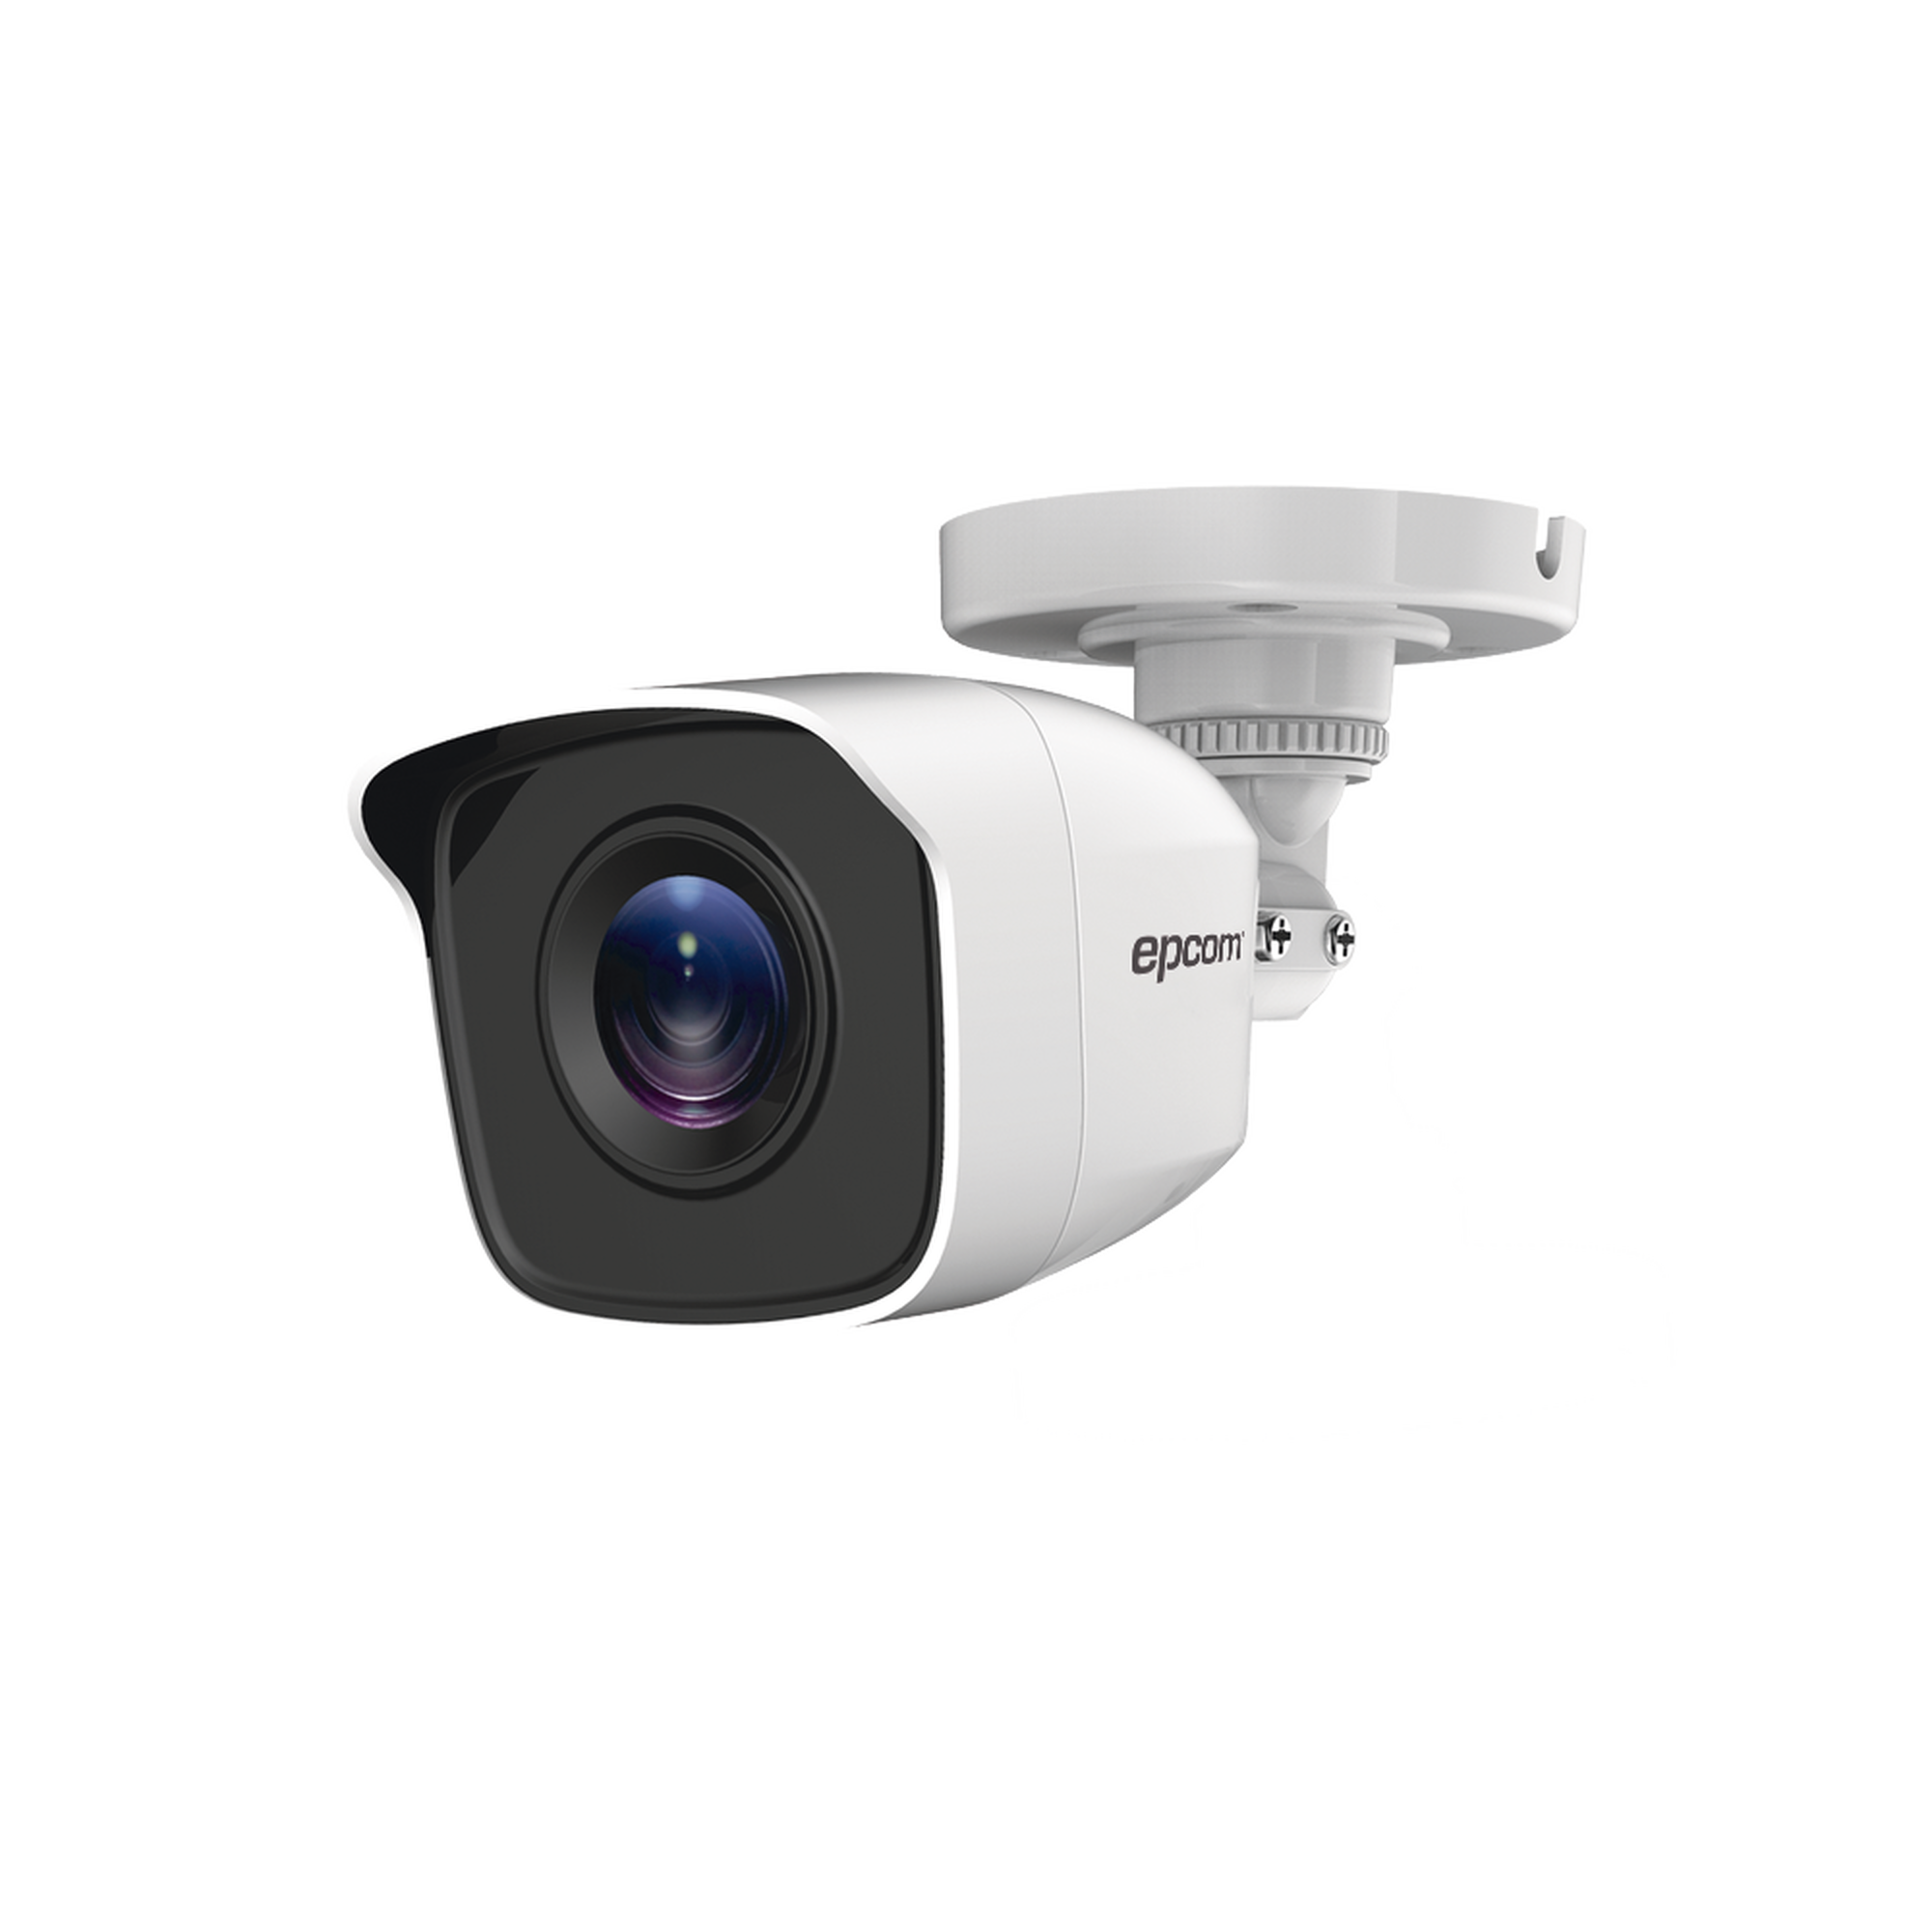 Bullet TURBOHD 720p / METáLICA / Gran Angular 92? / Lente 2.8 mm / IR EXIR Inteligente 20 mts / Exterior IP66 / 4 Tecnologías (TVI / AHD / CVI / CVBS)